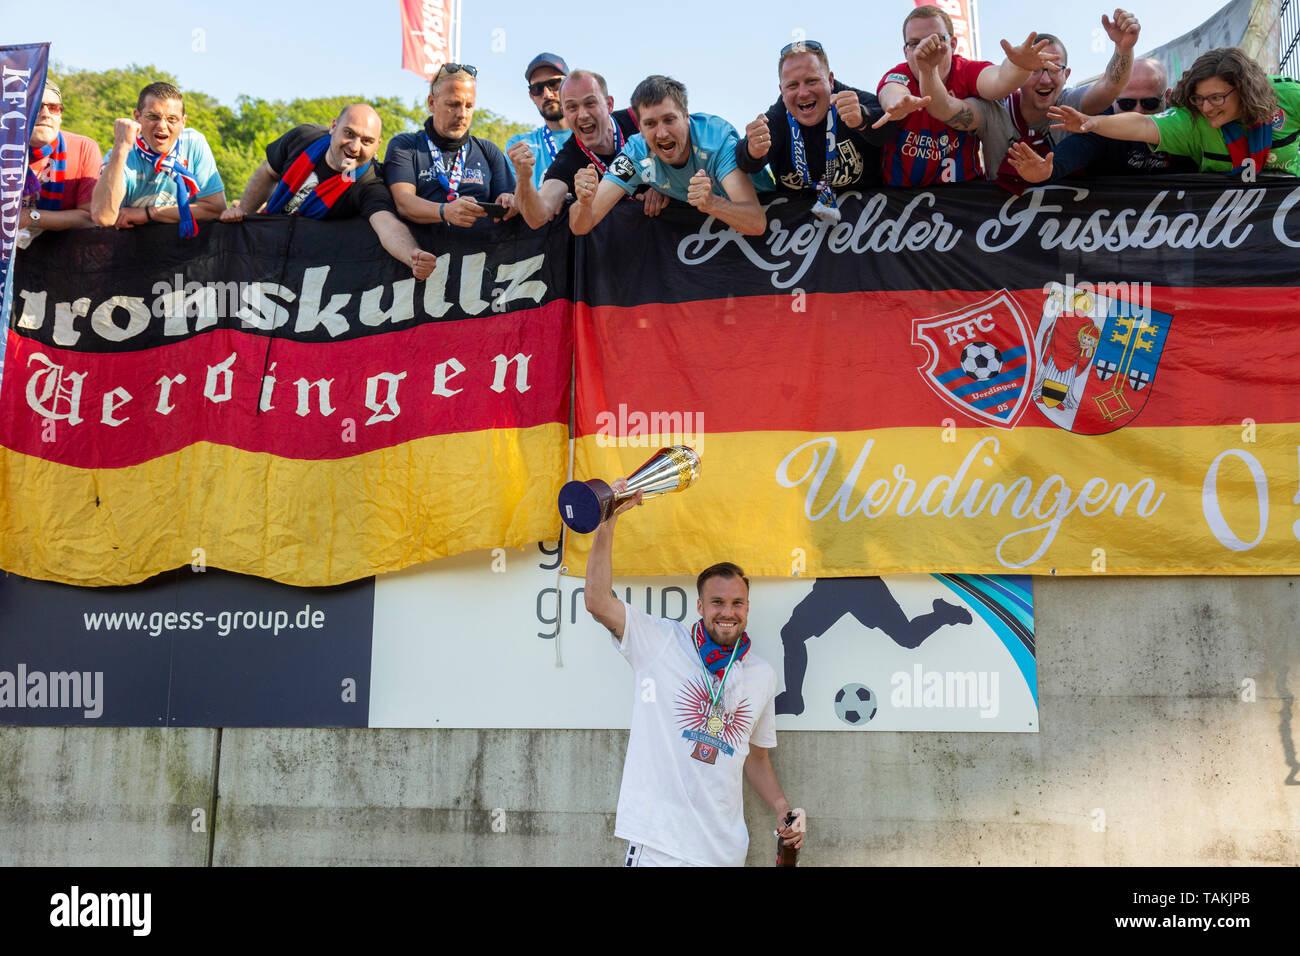 Sport, Fussball, Reviersport Niederrheinpokal, 2018/2019, Finale, Wuppertaler SV vs. KFC Uerdingen 1-2, Stadion Am Zoo in Wuppertal, Jubel nach dem Pokalsieg, Uerdinger Fussballfans und Kevin Grosskreutz (KFC) mit dem Pokal, sports, football, Lower Rhine Cup, 2018/2019, final, Wuppertaler SV vs. KFC Uerdingen 1-2, Stadium Am Zoo in Wuppertal, rejoicing at the cup victory, Uerdingen football fans and Kevin Grosskreutz (KFC) presenting the cup *** Local Caption *** sports, football, Lower Rhine Cup, 2018/2019, final, Wuppertaler SV vs. KFC Uerdingen 1-2, Stadium Am Zoo in Wuppertal, rejoicing at - Stock Image